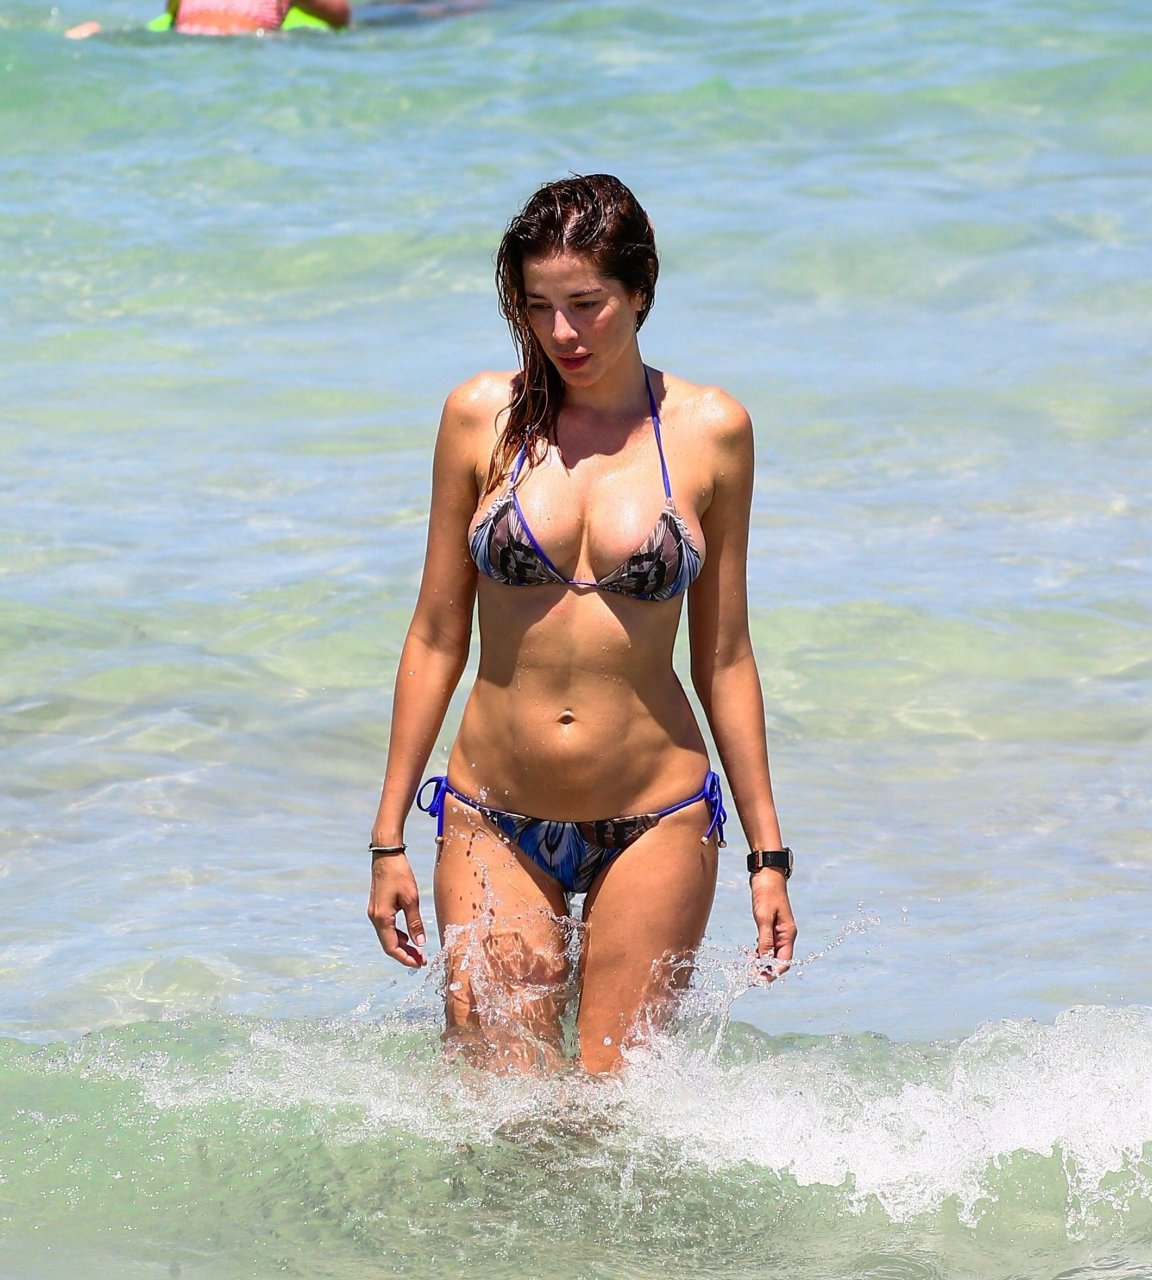 Bikinis on the beach pics